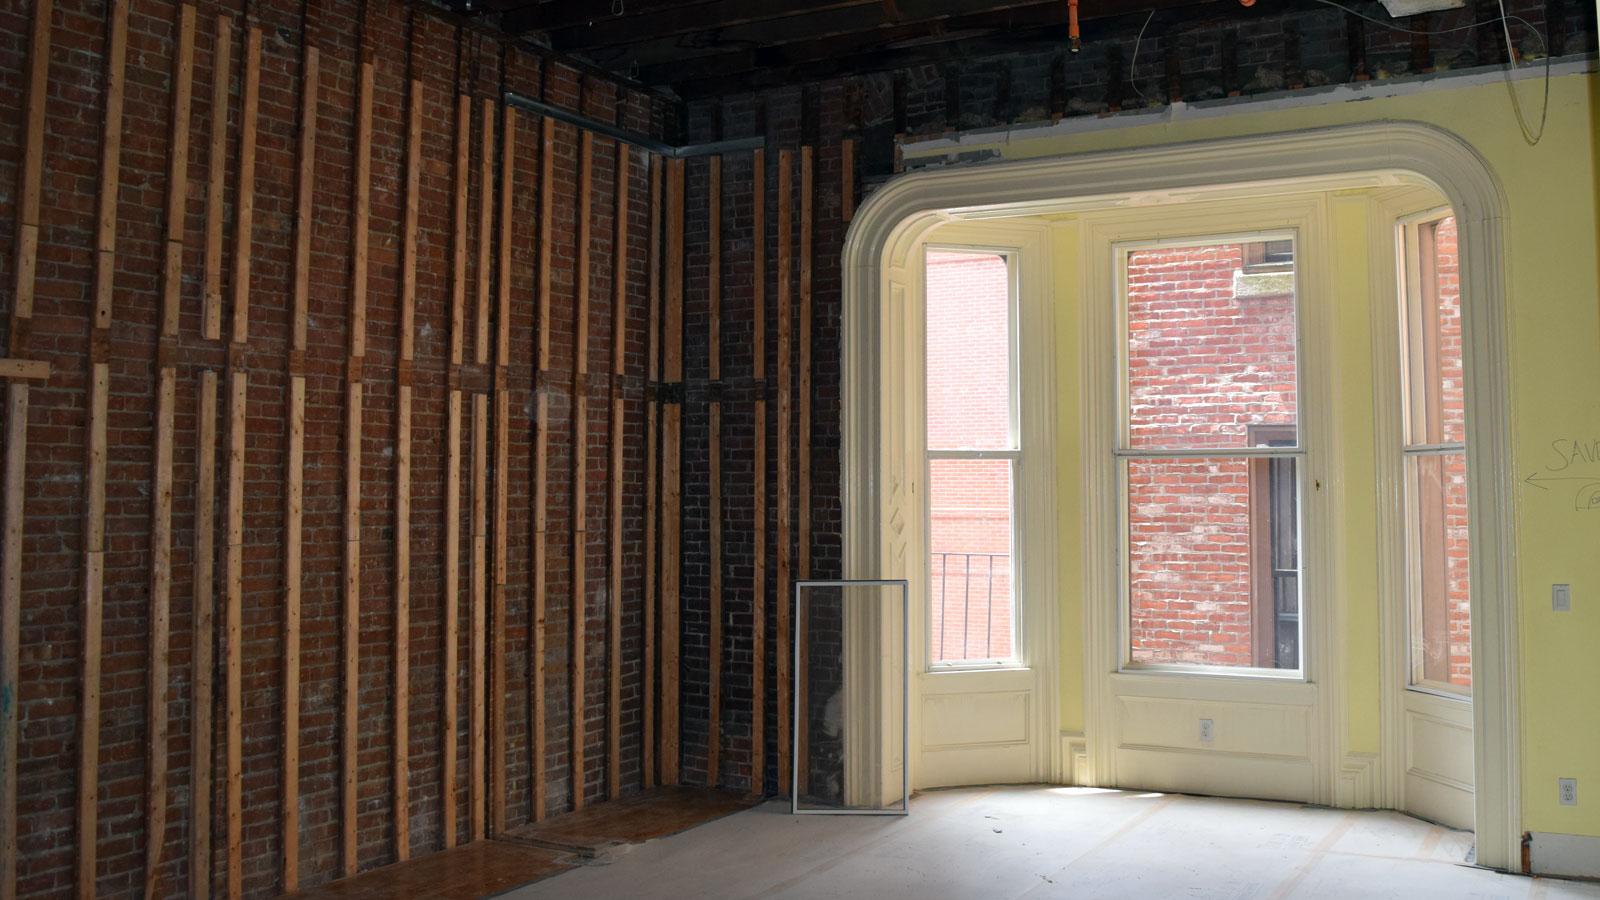 VERTEX, Structural Engineering Design, Residential Renovation, Boston, MA